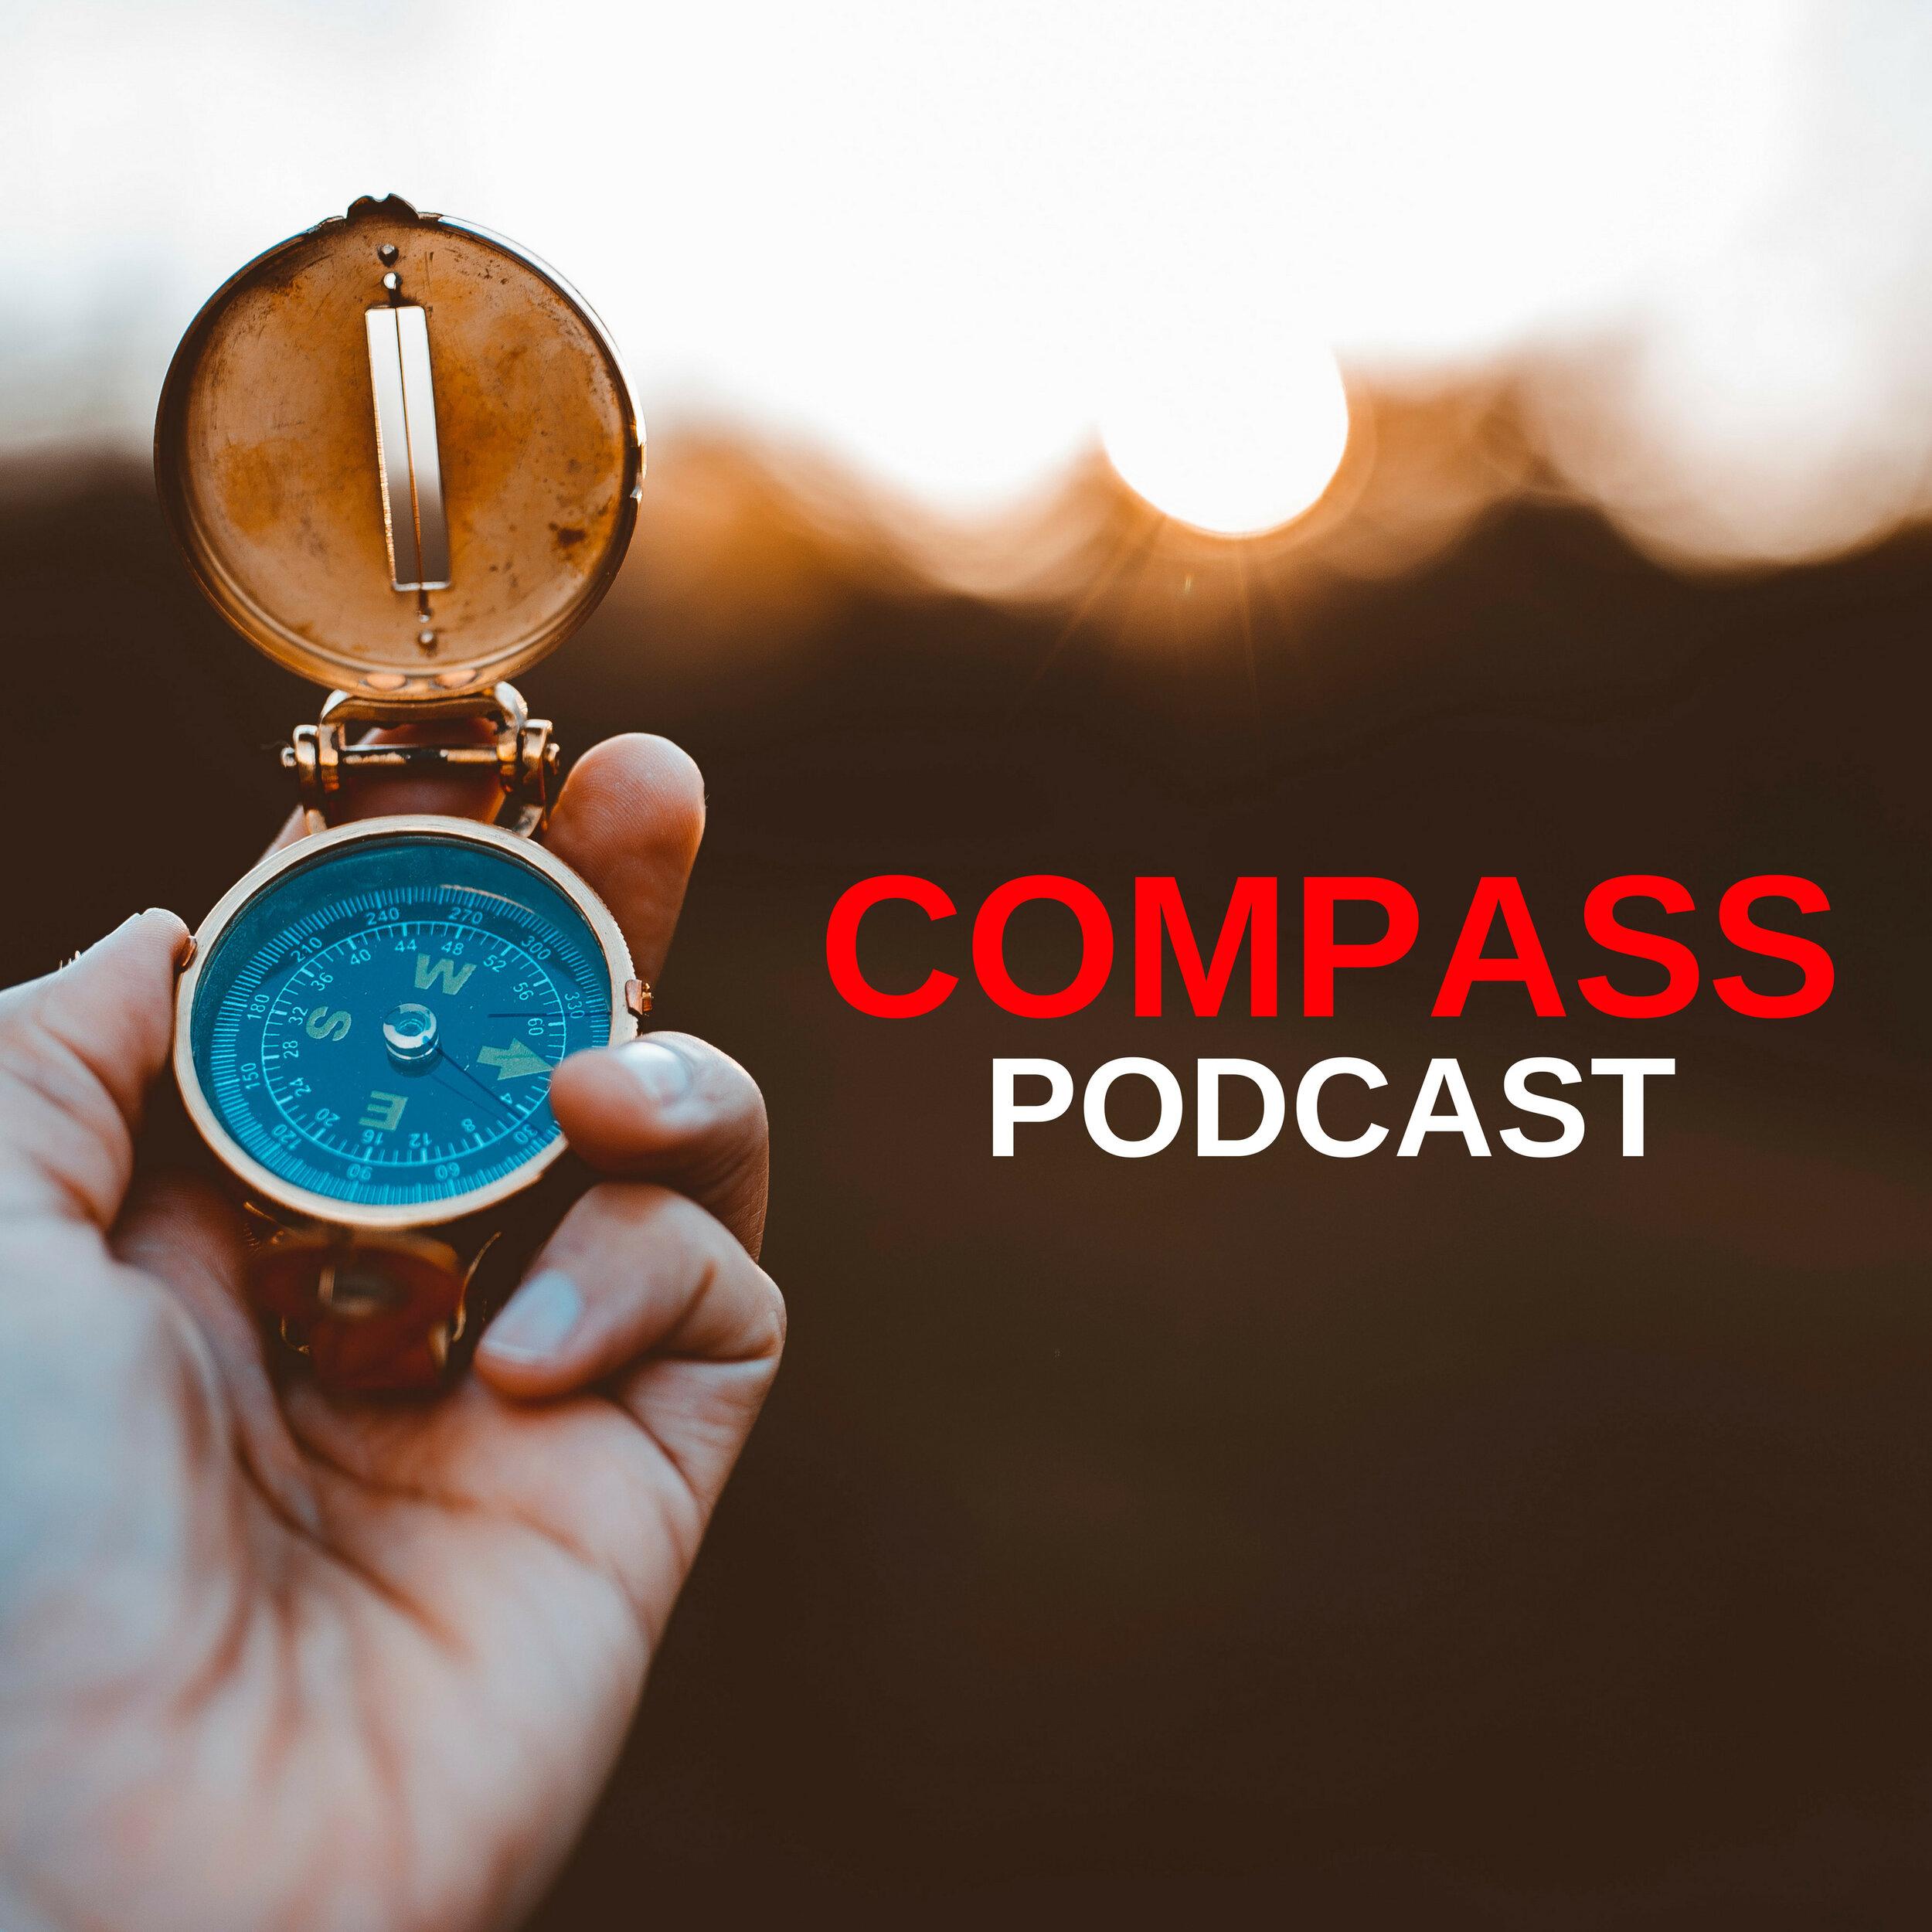 Compass Podcast